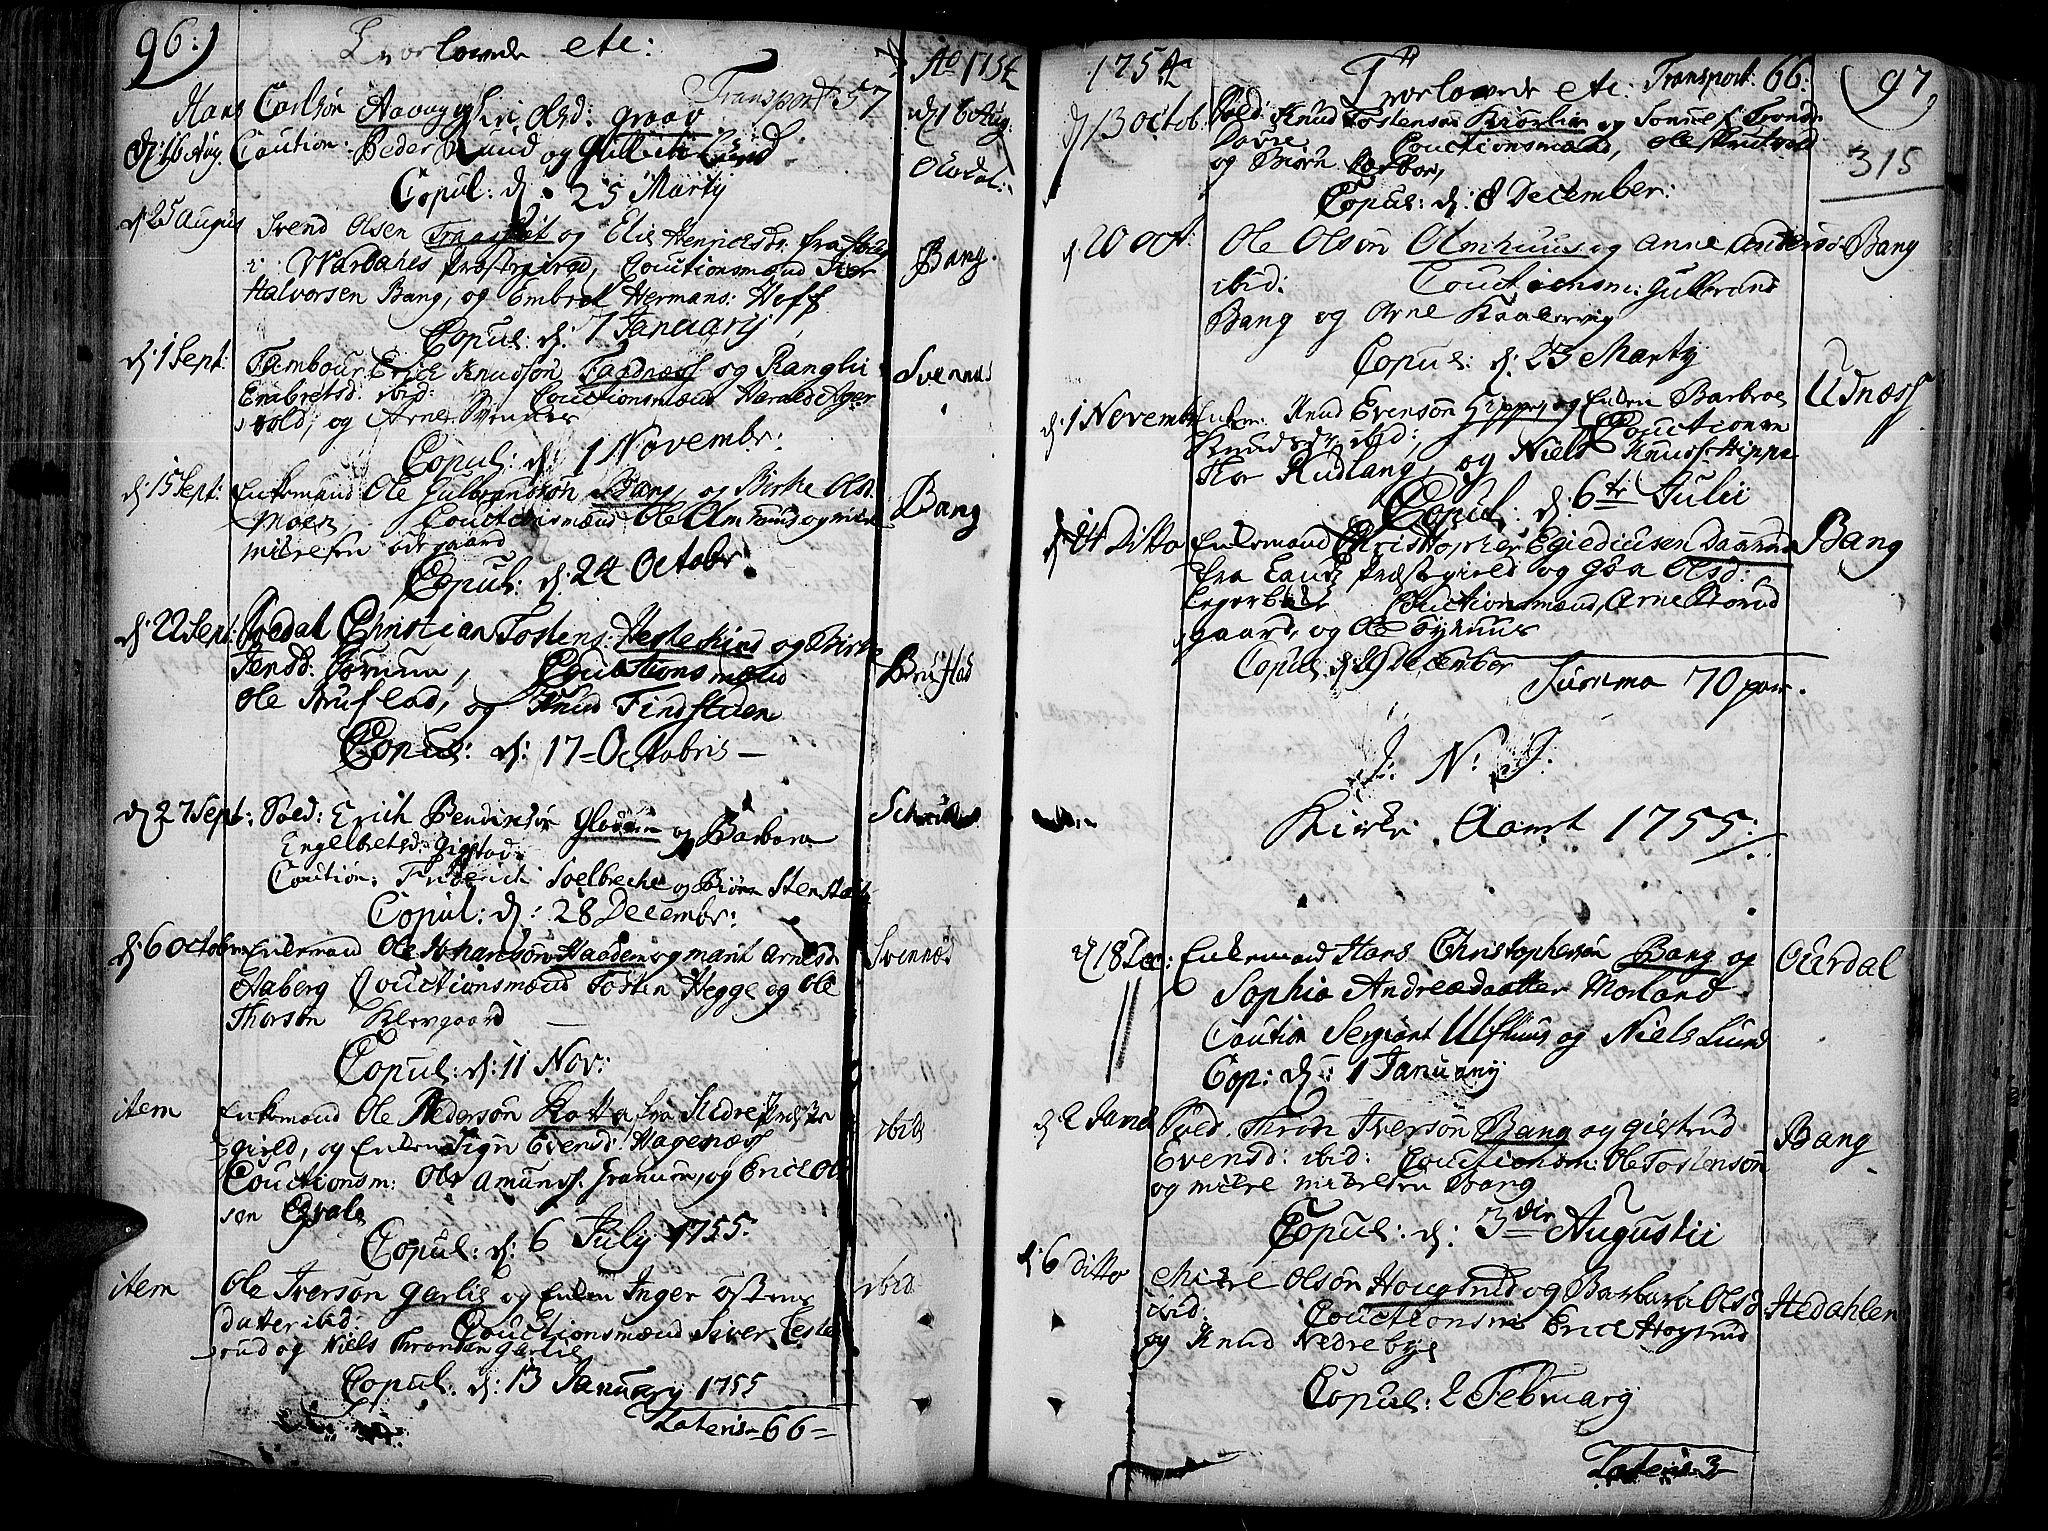 SAH, Aurdal prestekontor, Ministerialbok nr. 4, 1730-1762, s. 96-97